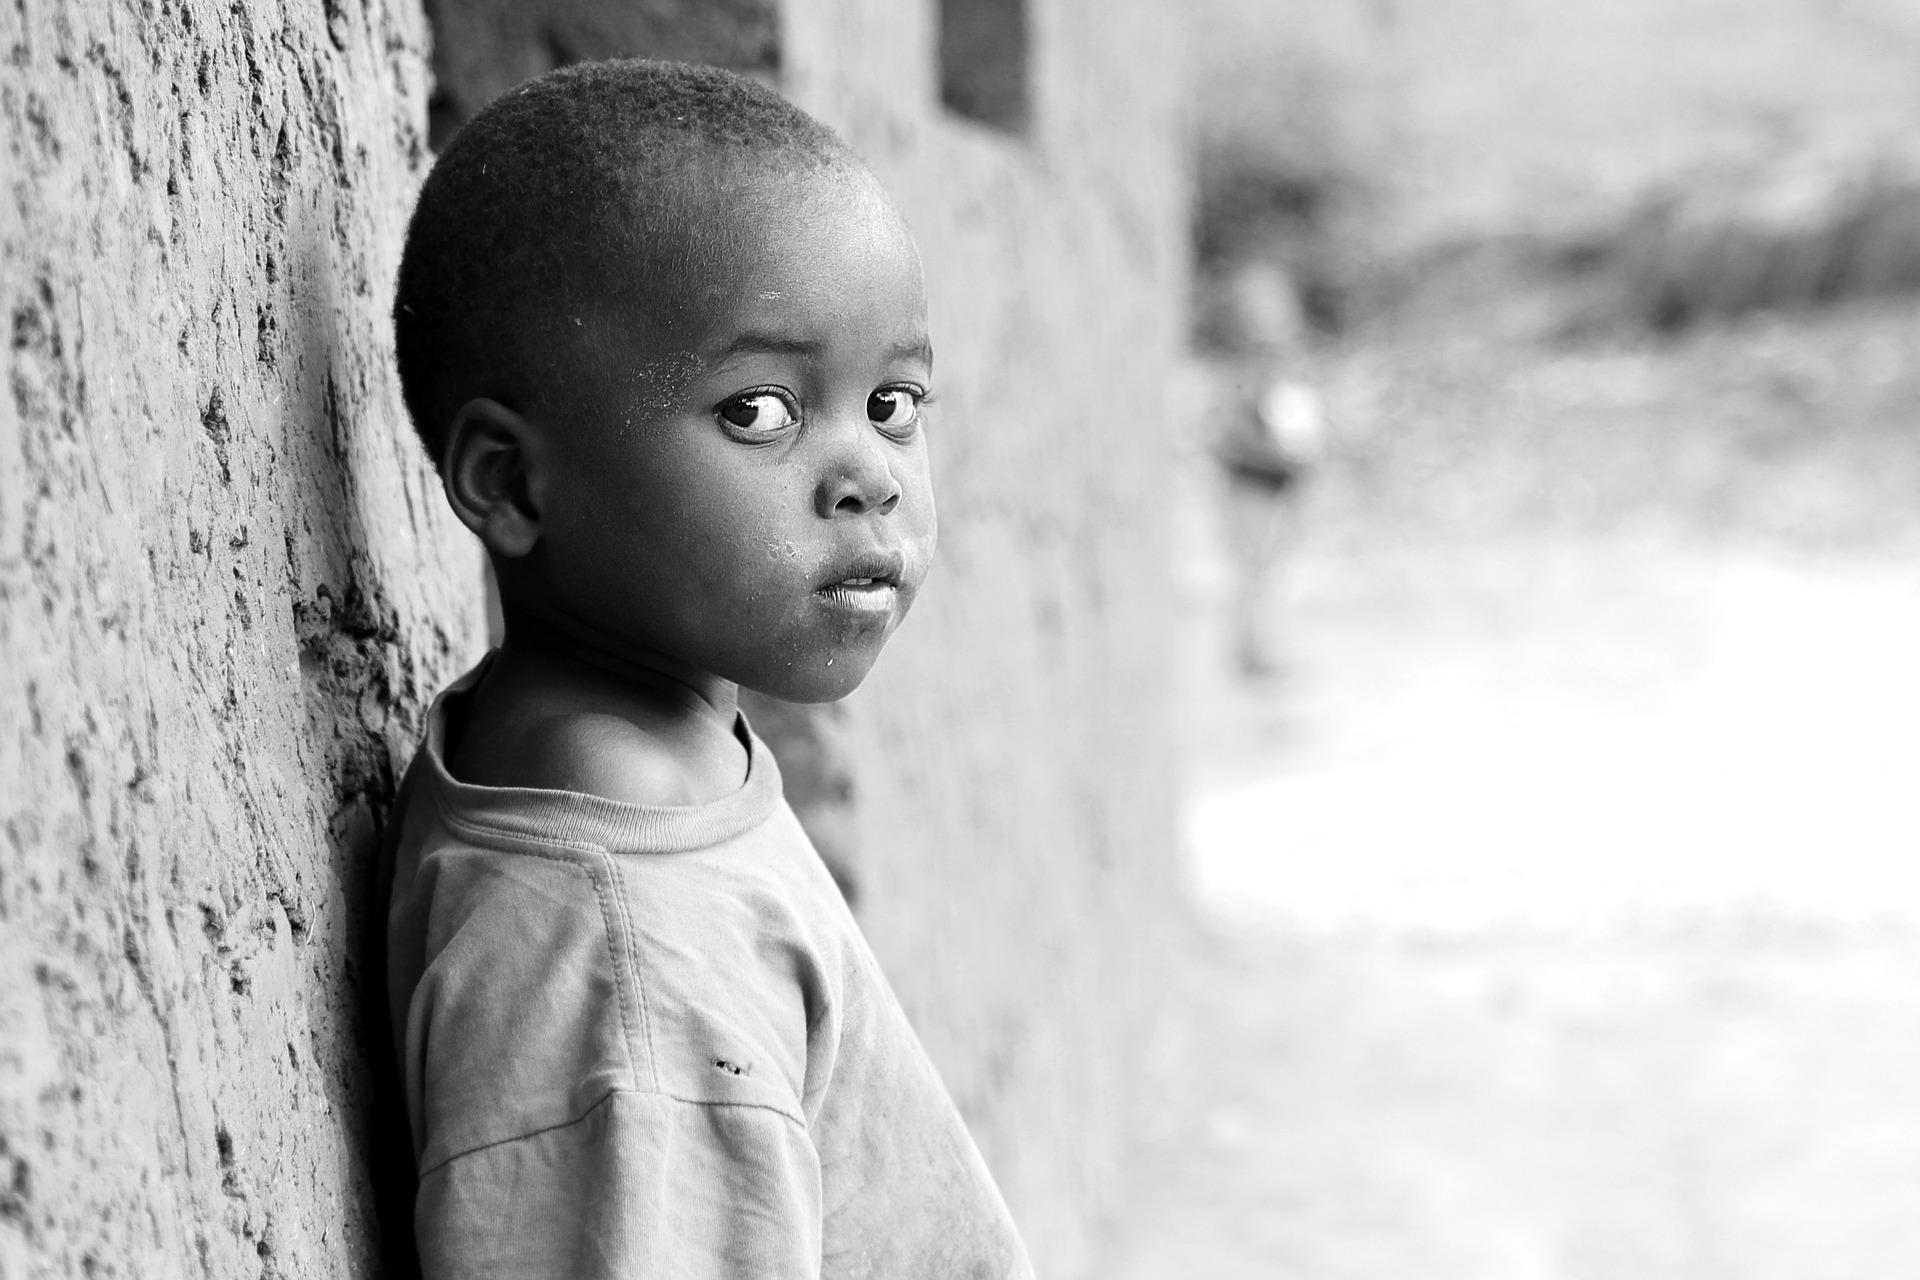 Eλονοσία: 435.000 παιδιά κάτω των 5 ετών έχασαν τη ζωή τους το 2017…